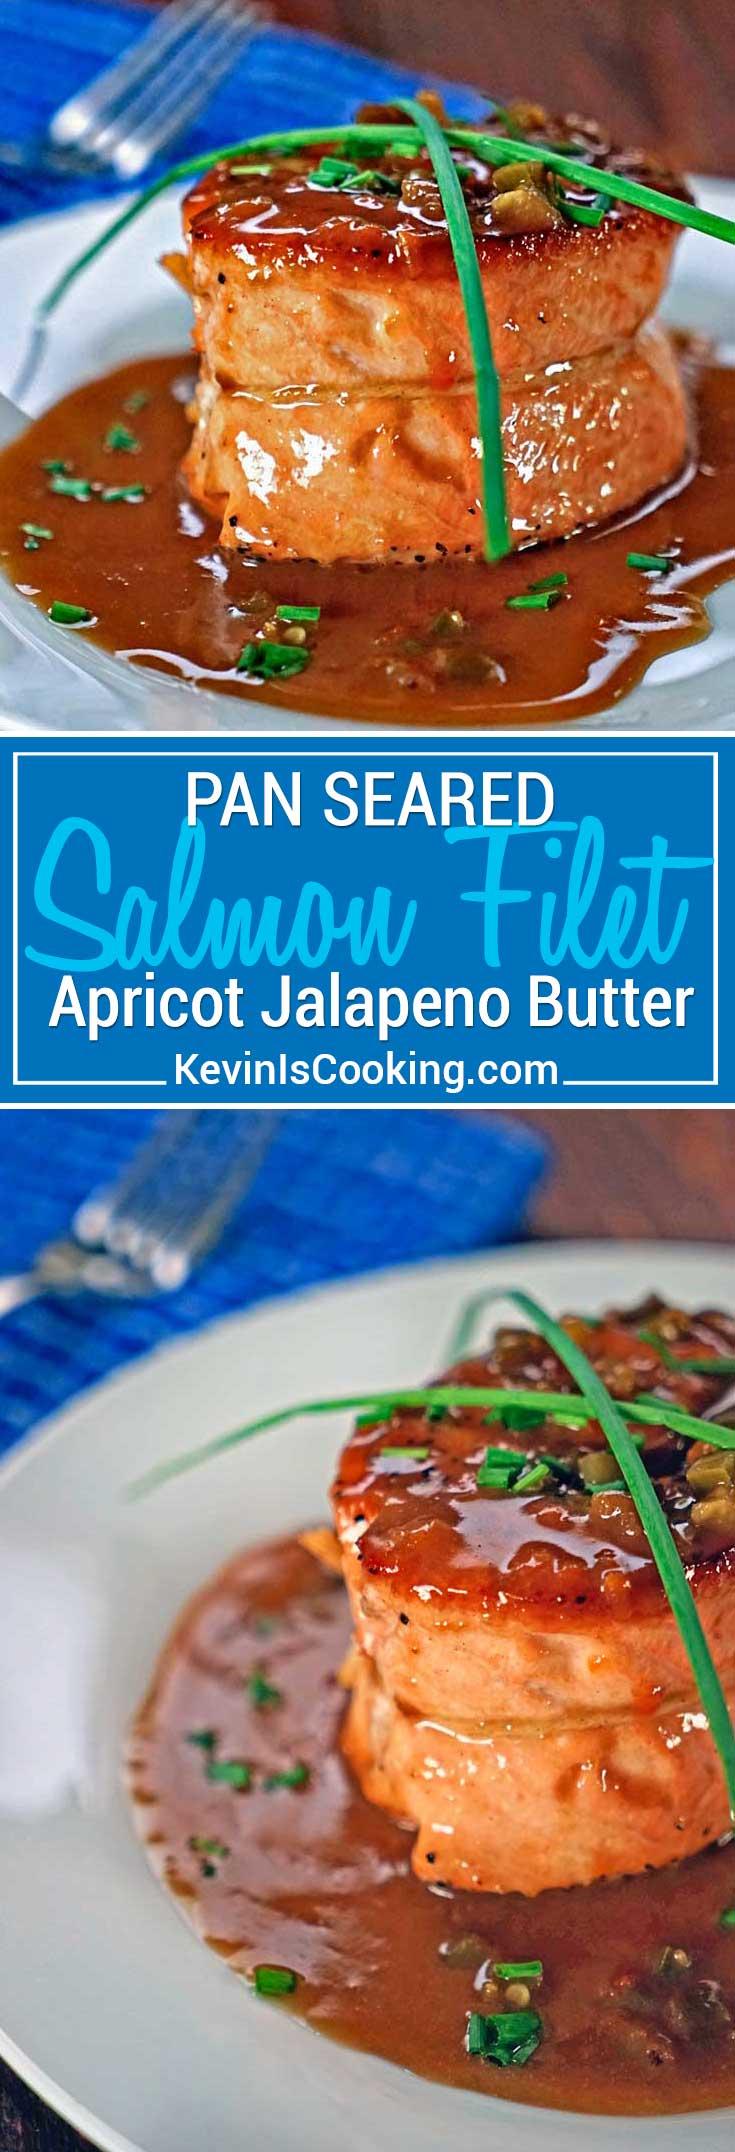 Pan Seared Salmon Filet with Apricot Jalapeno Butter Sauce - Pan seared salmon filets with a butter, balsamic, apricot preserve and jalapeno sauce.